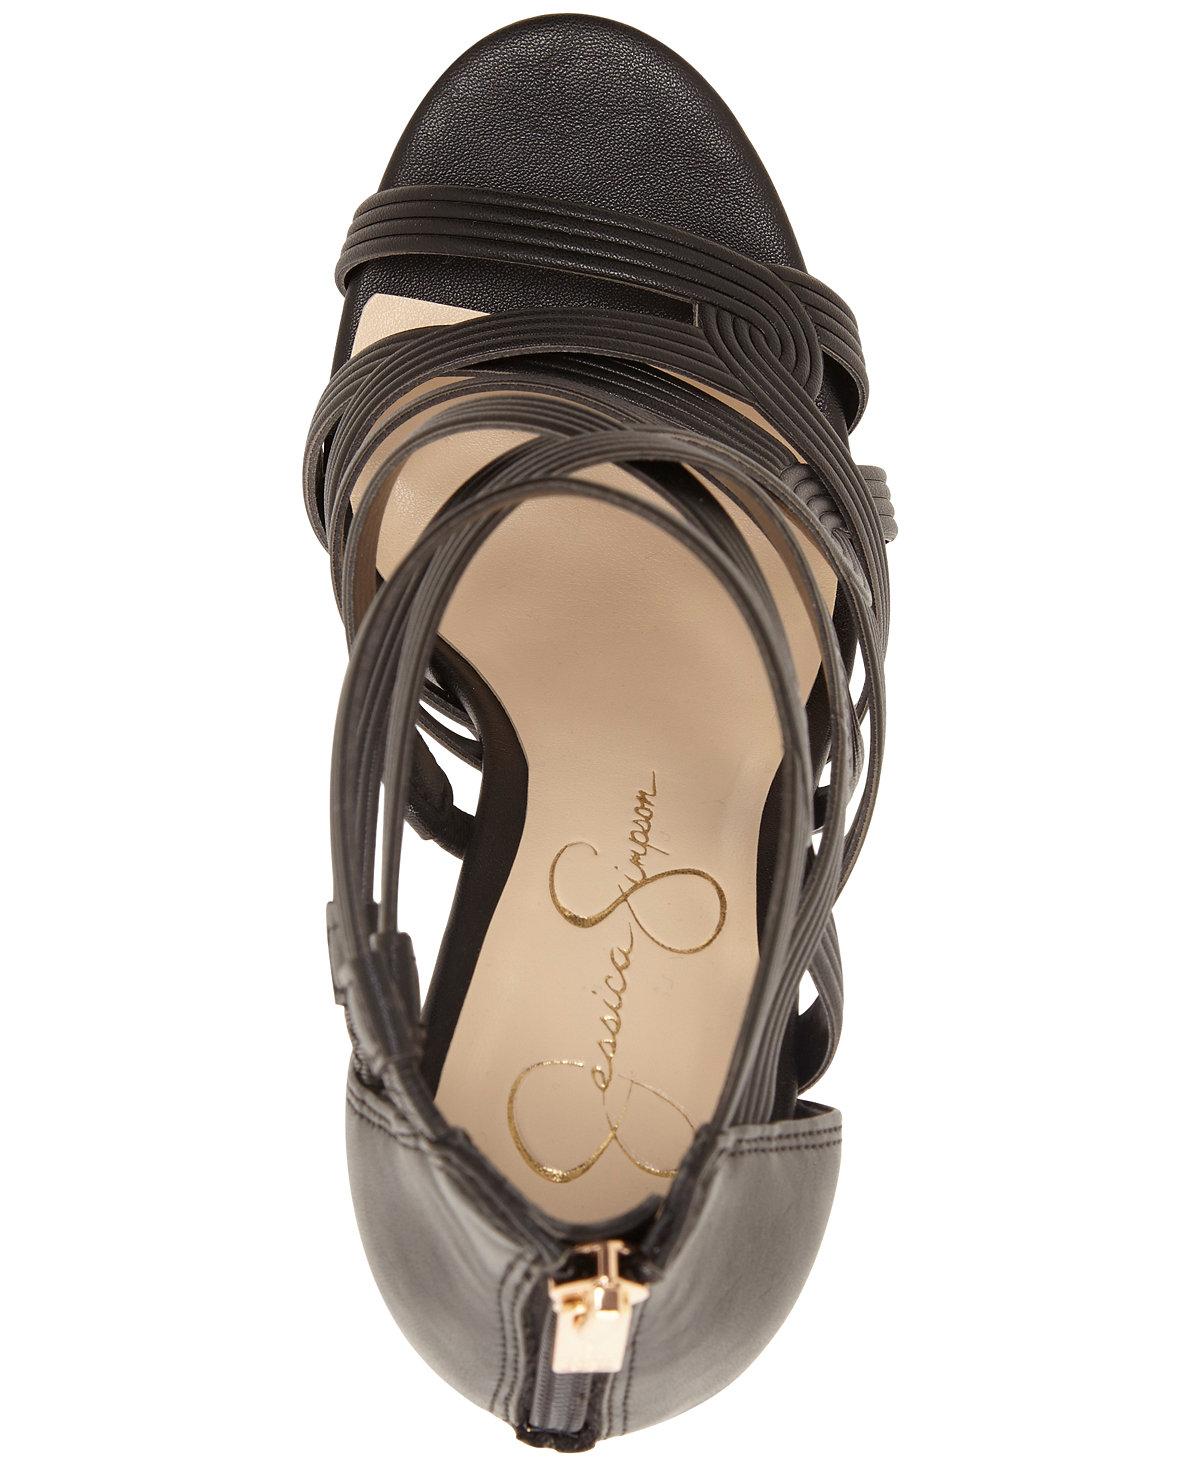 Jessica-Simpson-Womens-Rainah-Strappy-Dress-Heels